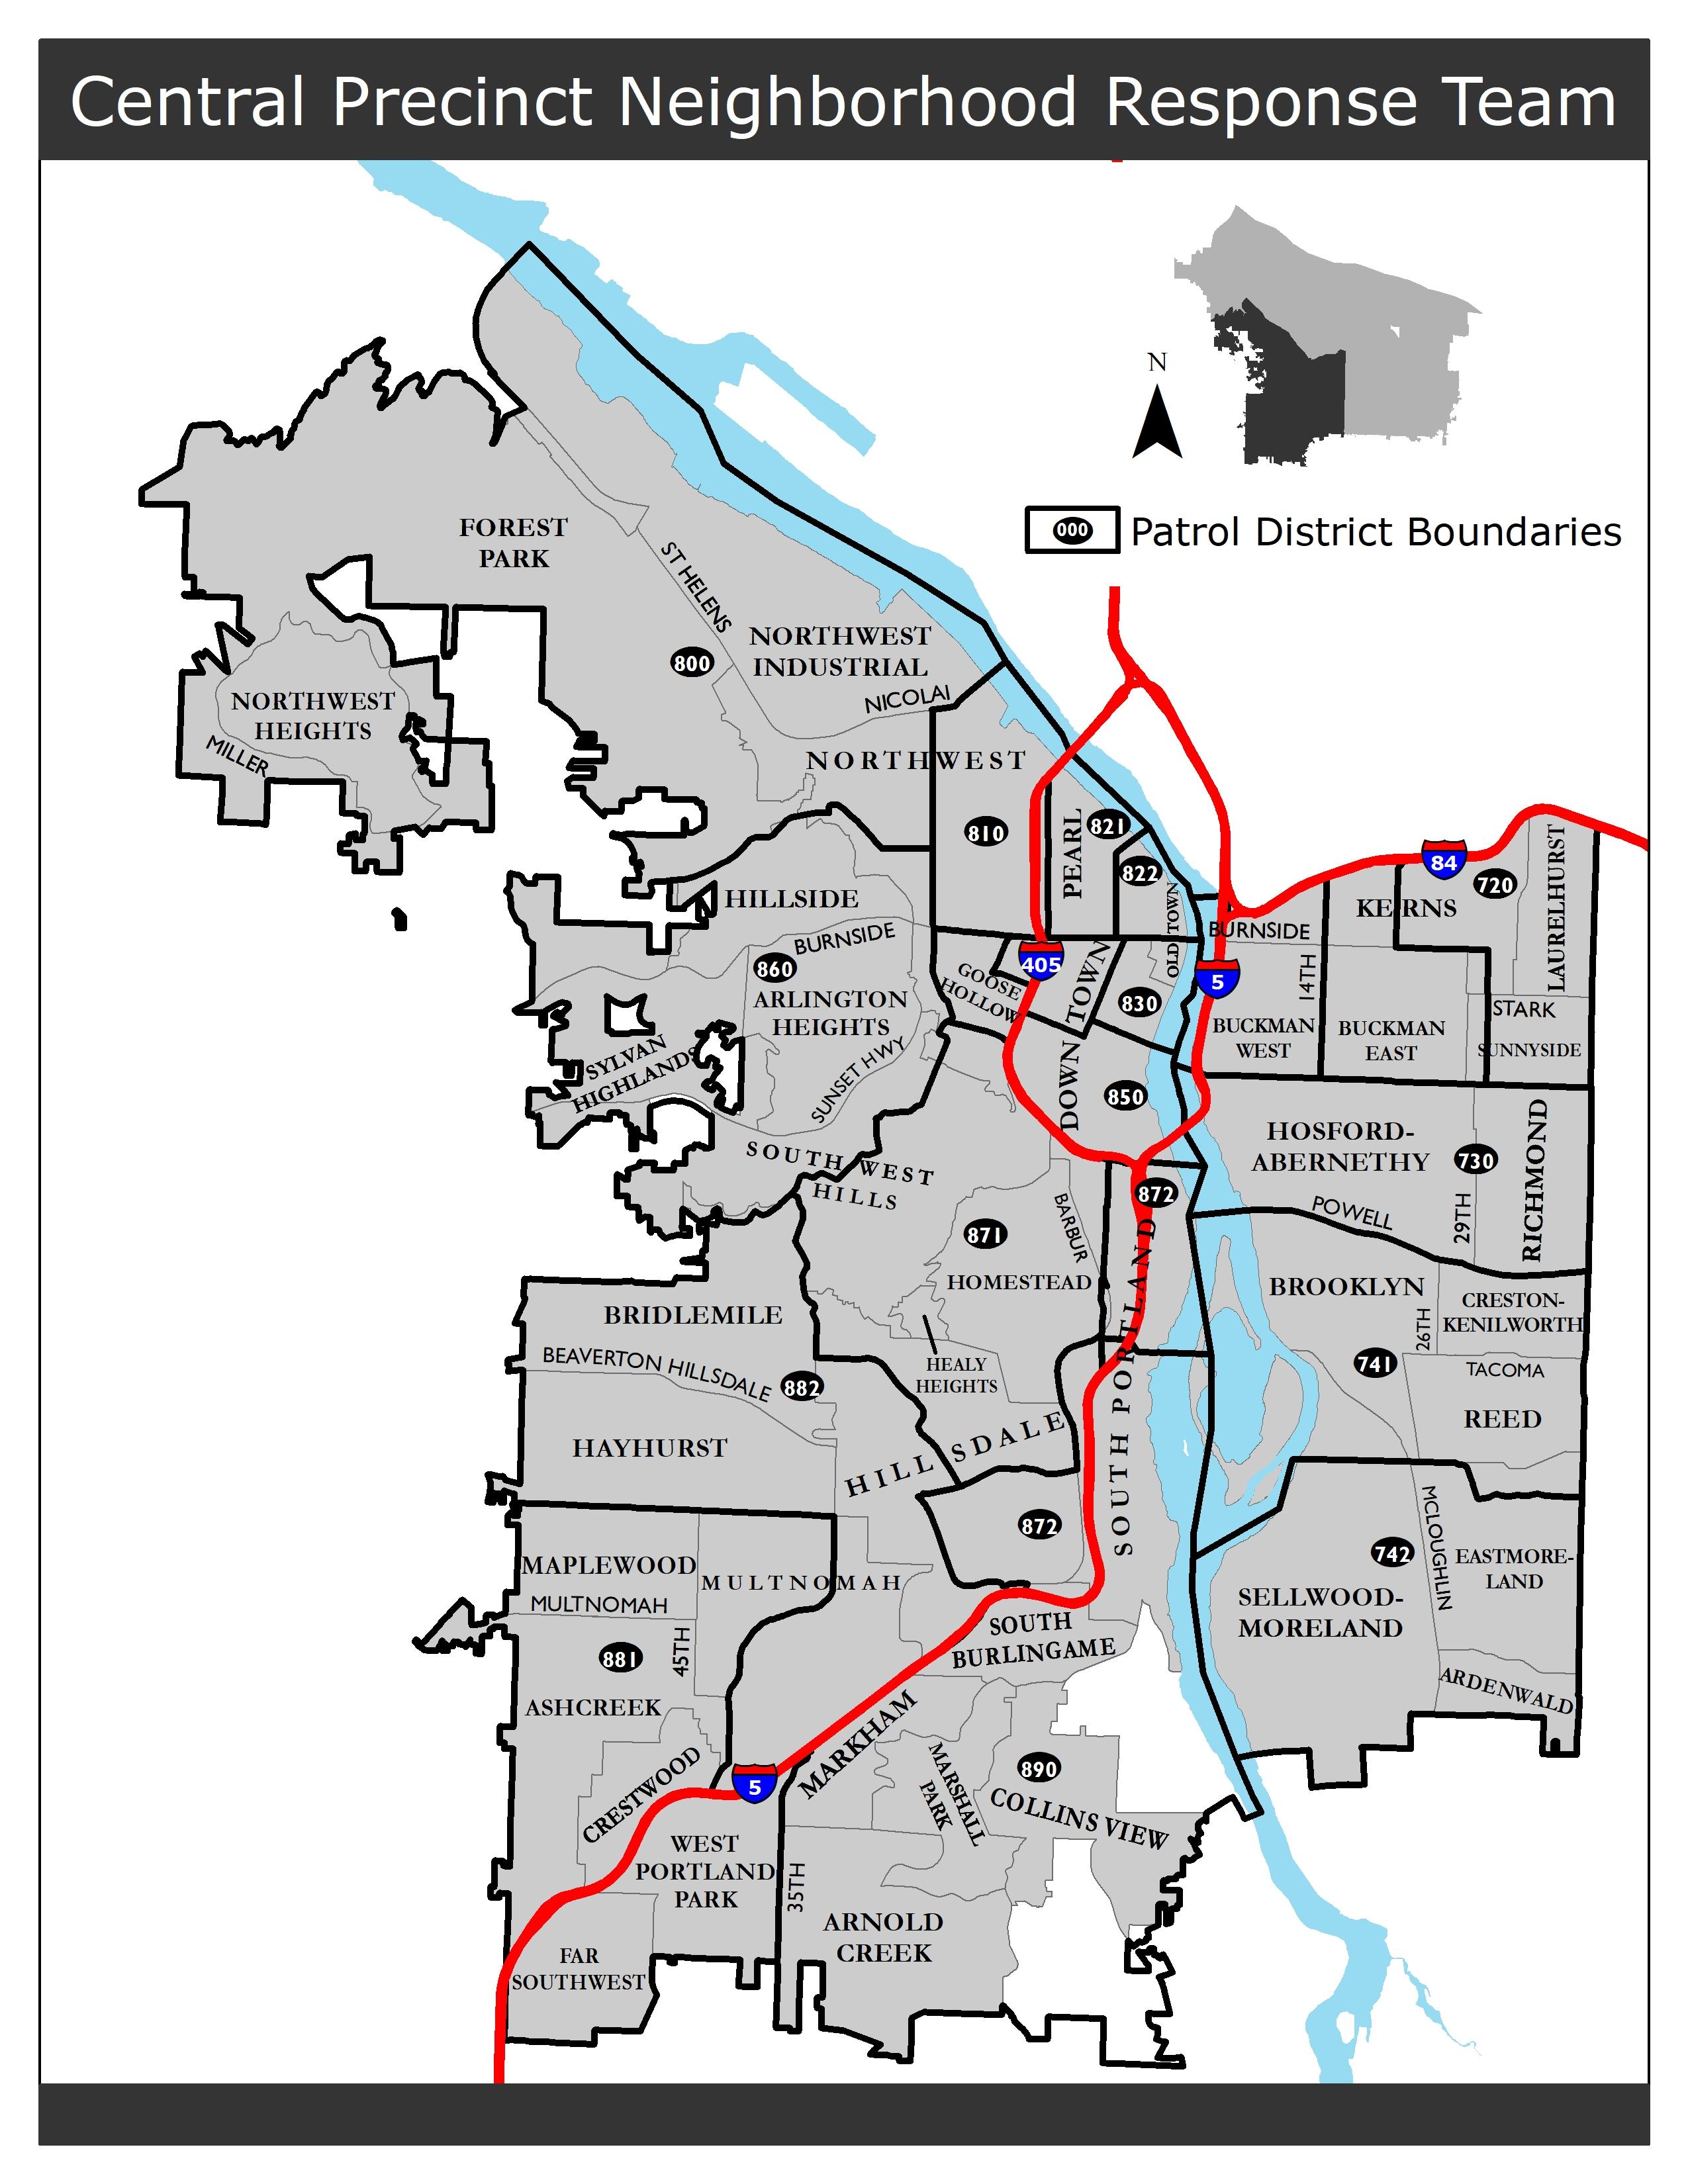 Oregon Precinct Map Precinct and Neighborhood Maps   The City of Portland, Oregon